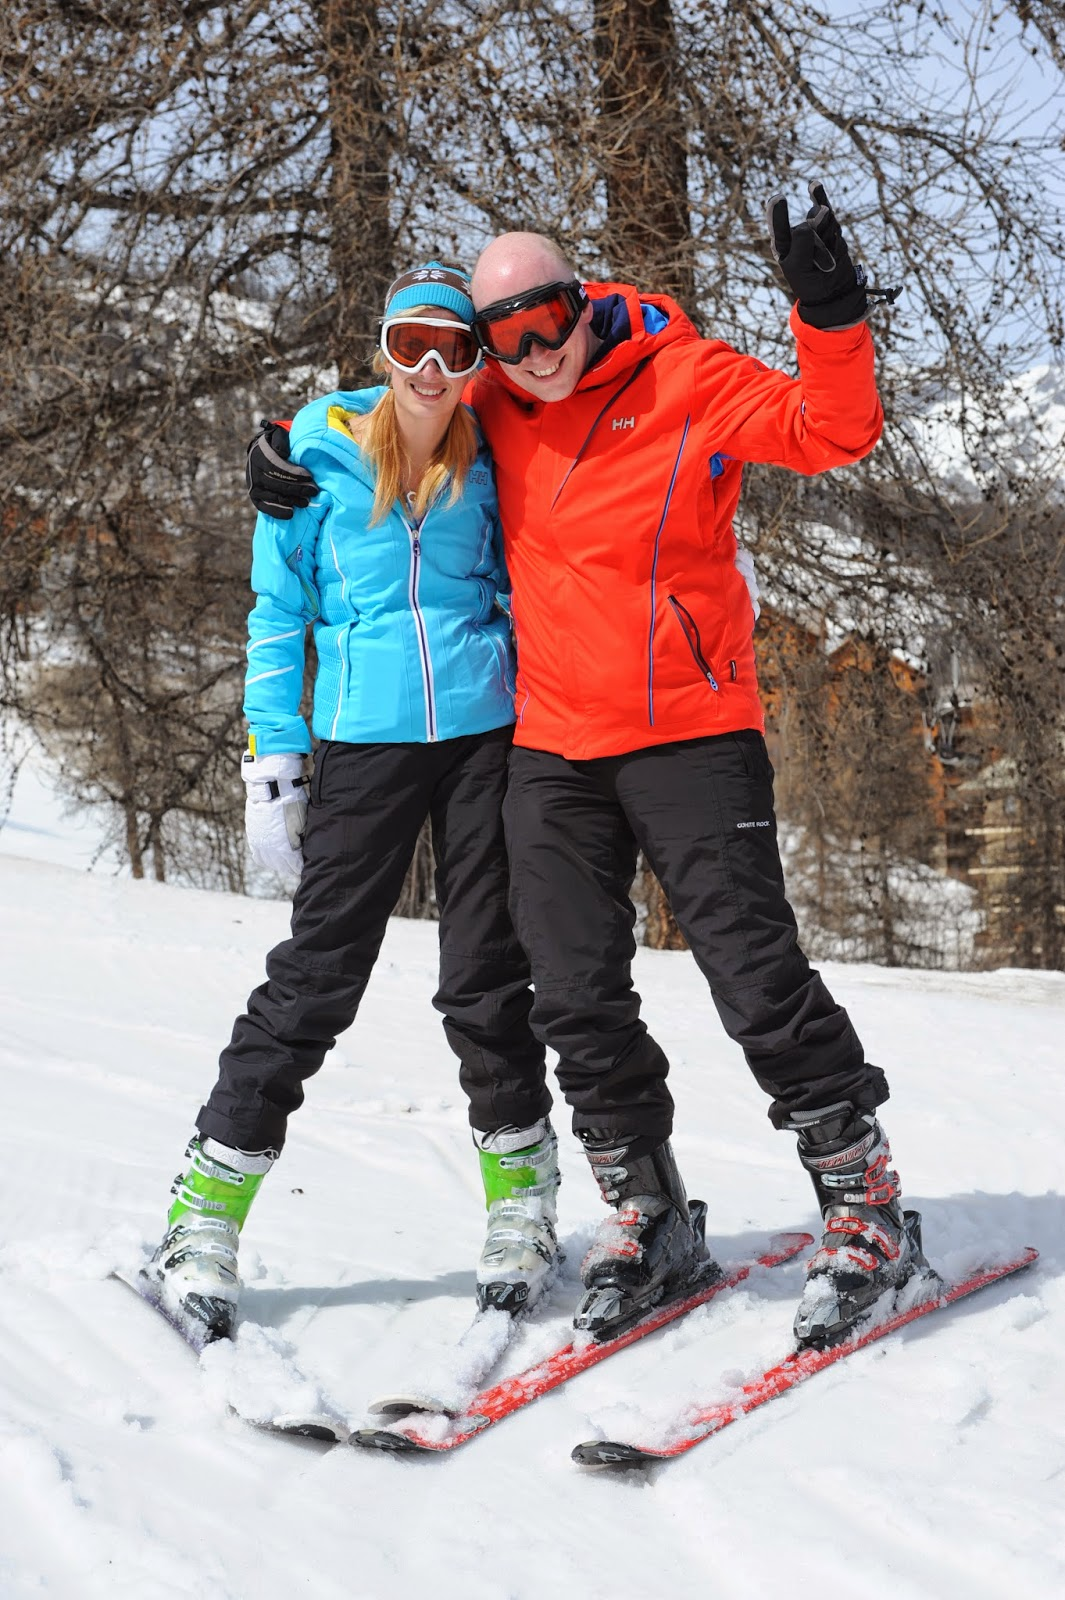 The Adventure of Parenthood: Helly Hansen Ski Wear Review